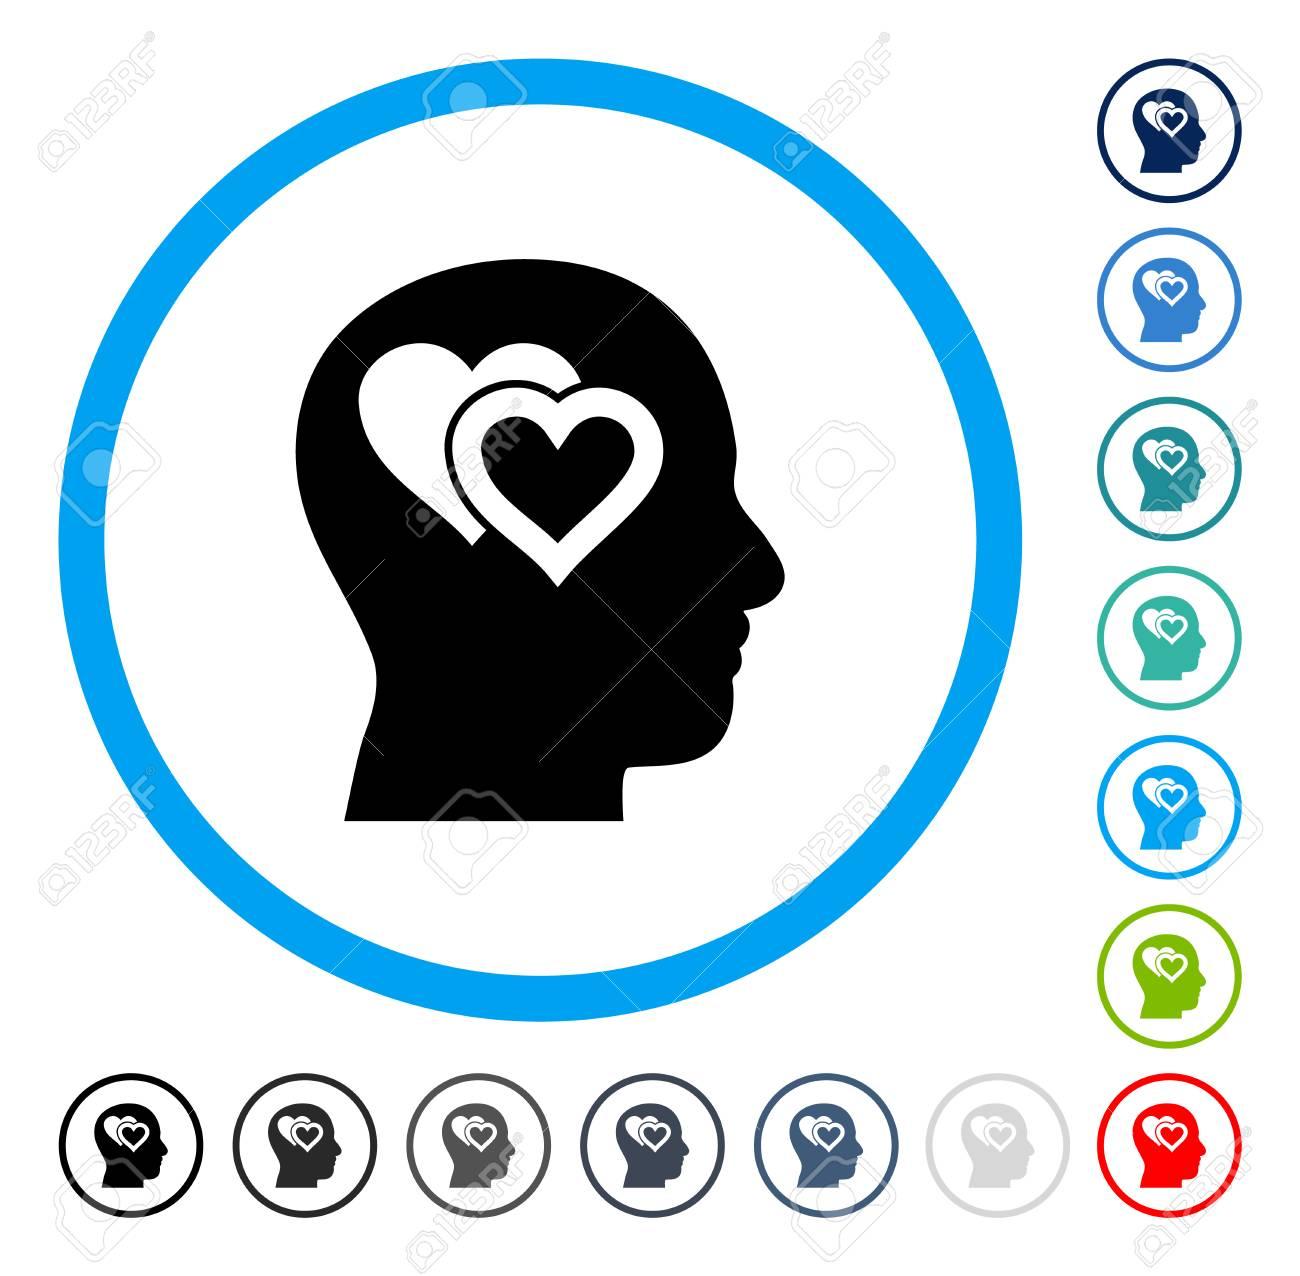 Love in mind icon inside circle frame vector illustration style love in mind icon inside circle frame vector illustration style is a flat iconic symbol buycottarizona